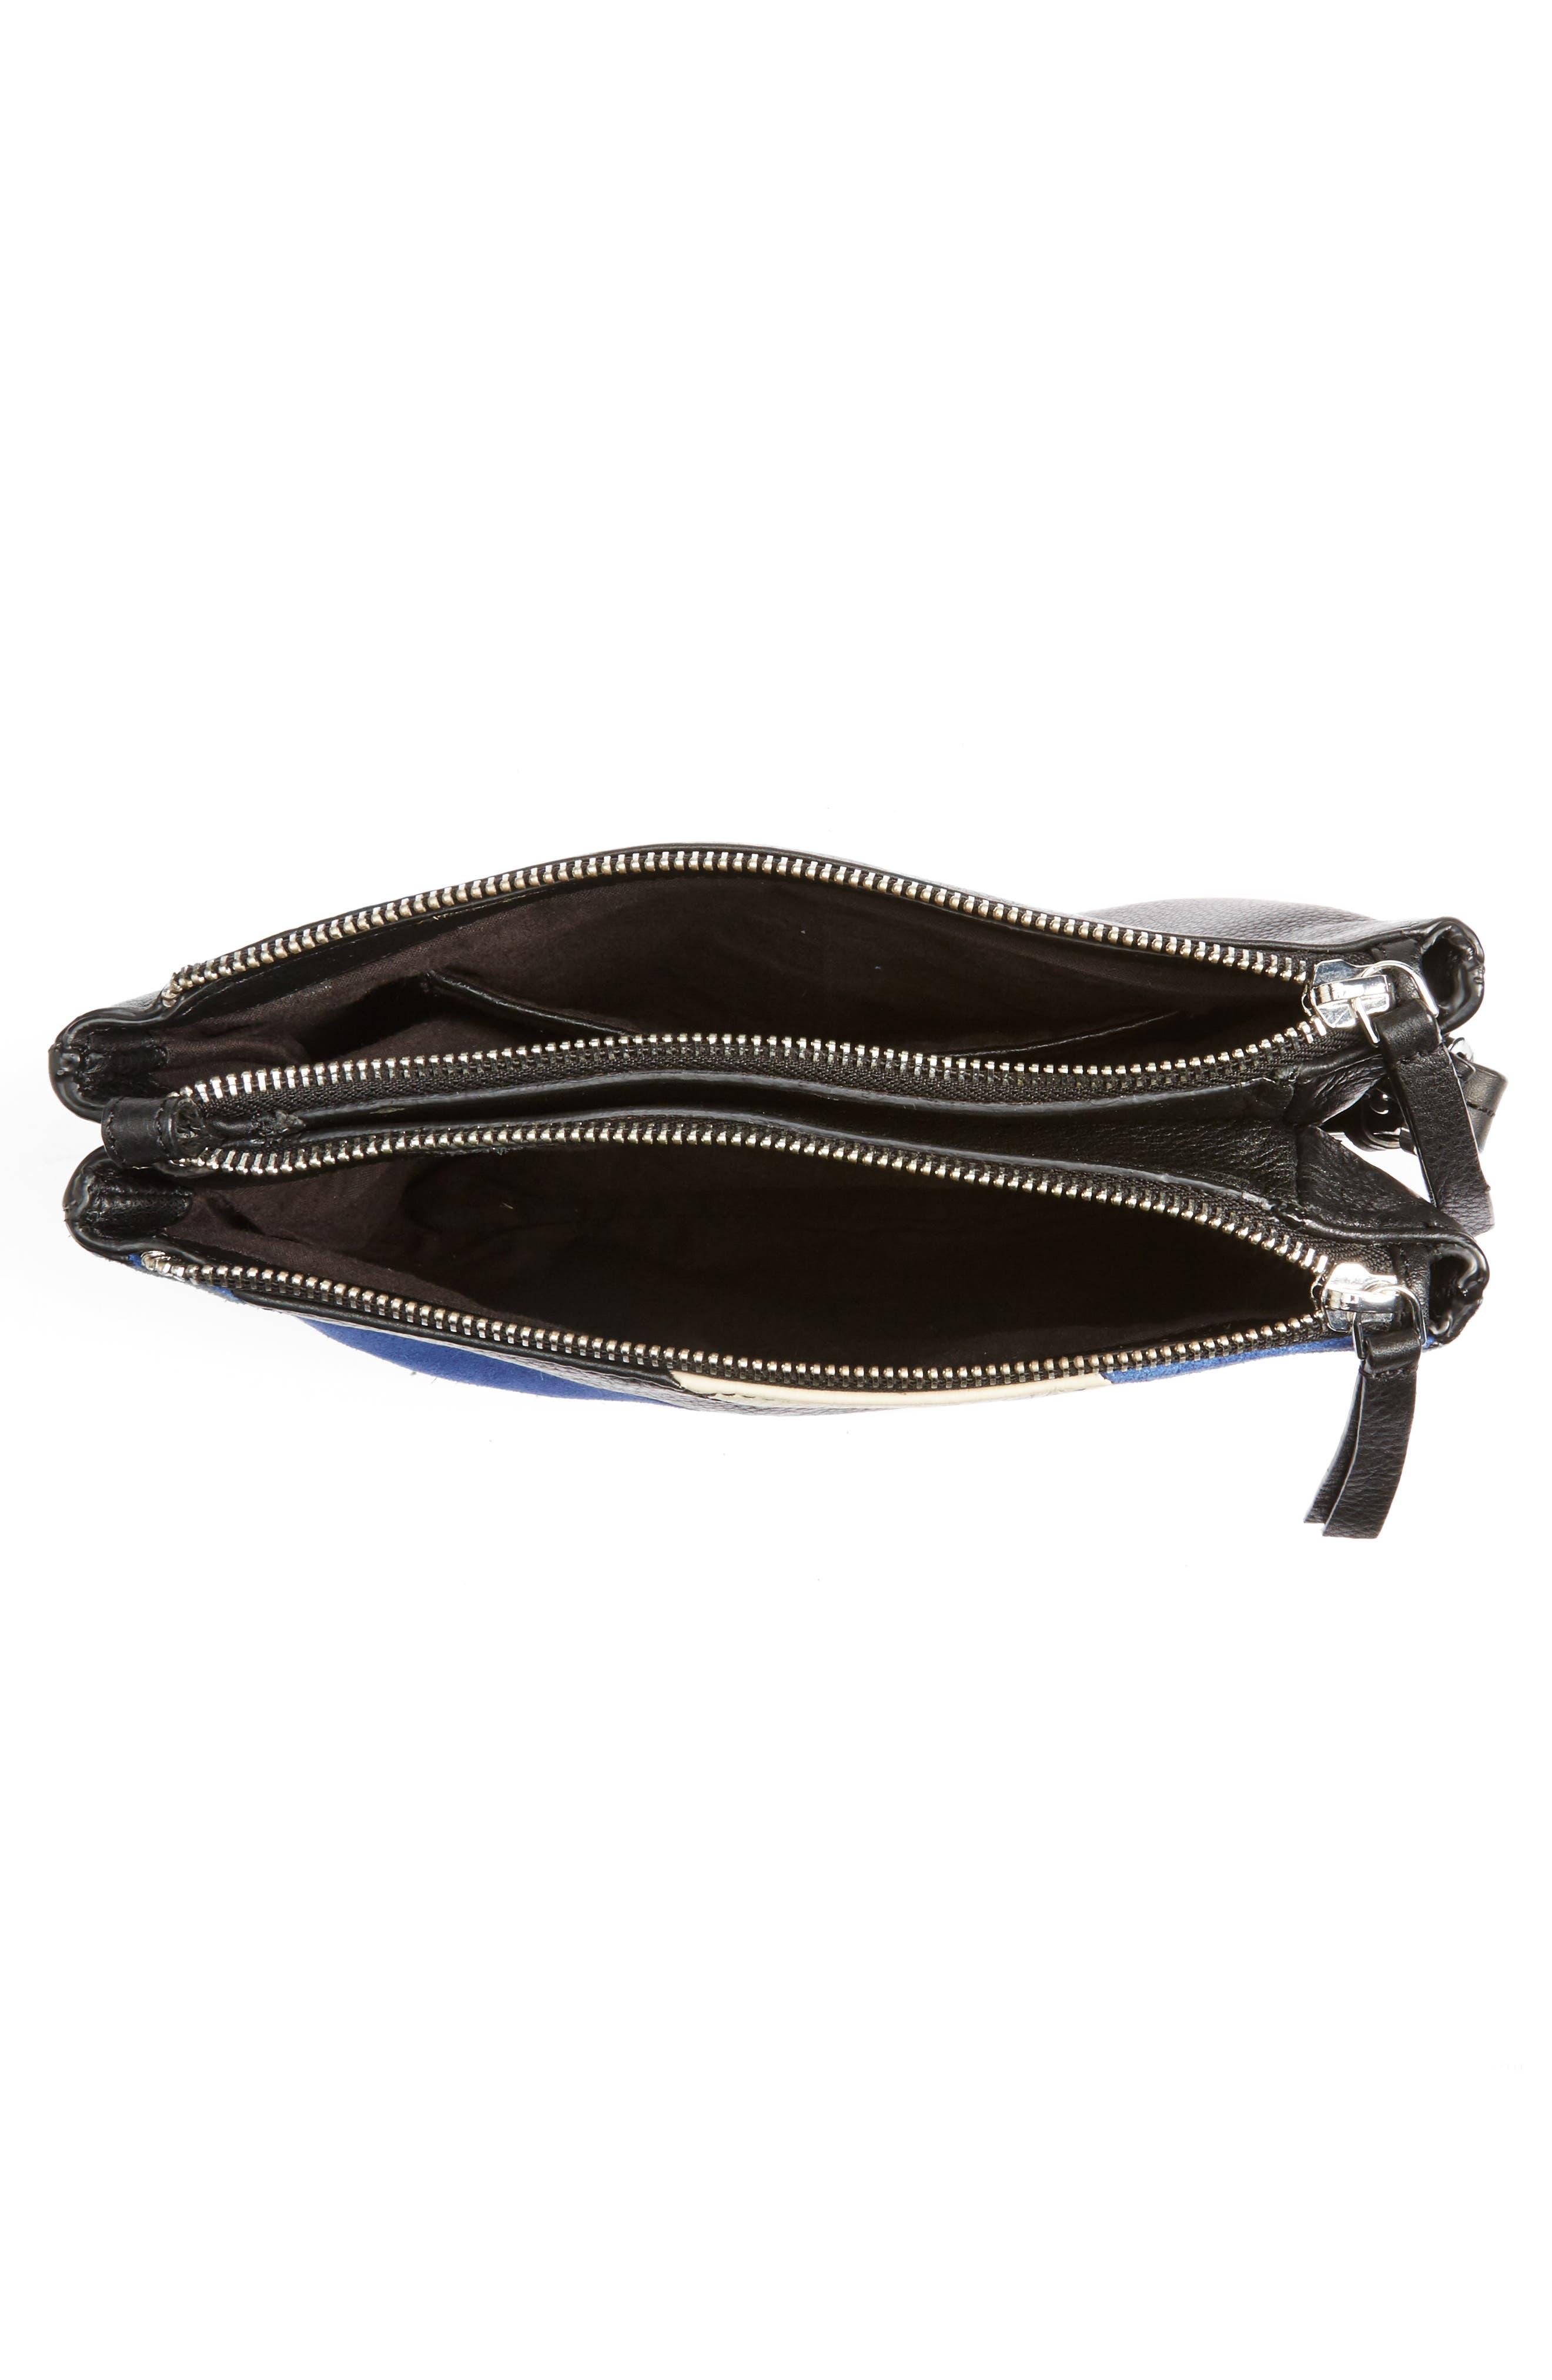 Premium Leather Bridget Crossbody Bag,                             Alternate thumbnail 4, color,                             001